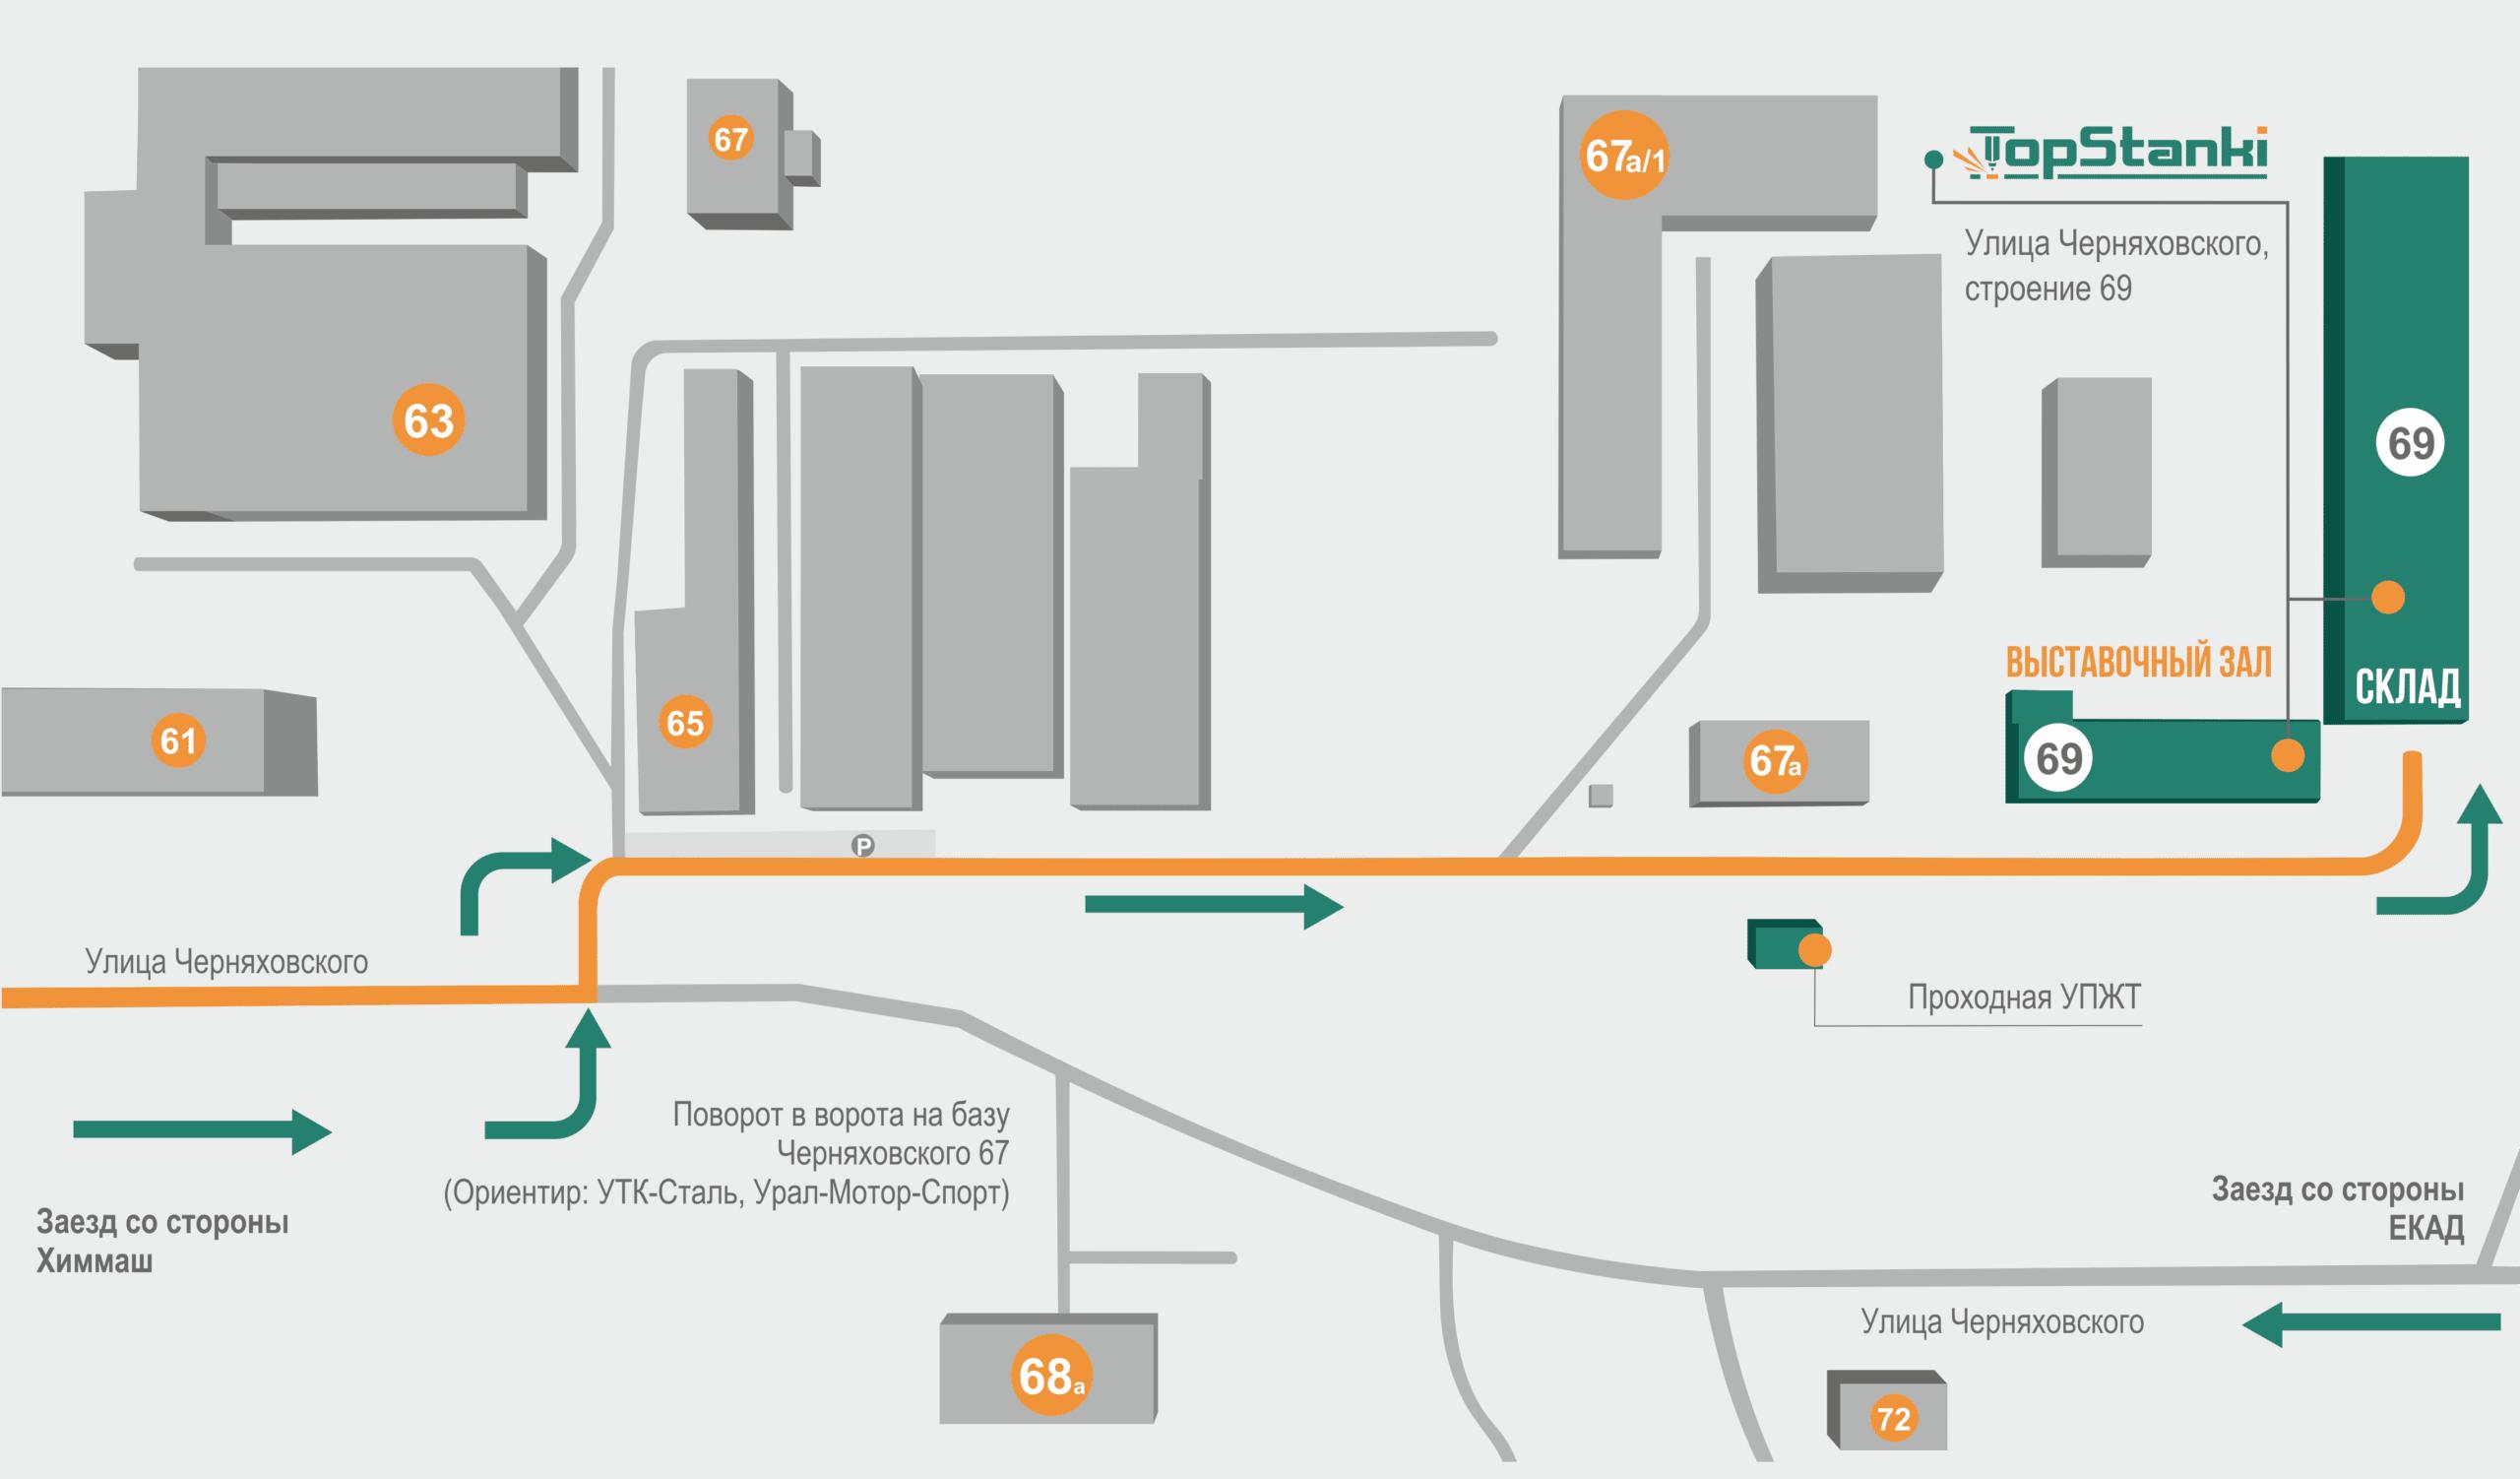 ТопСтанки Екатеринбург. Карта проезда на склад и шоурум.